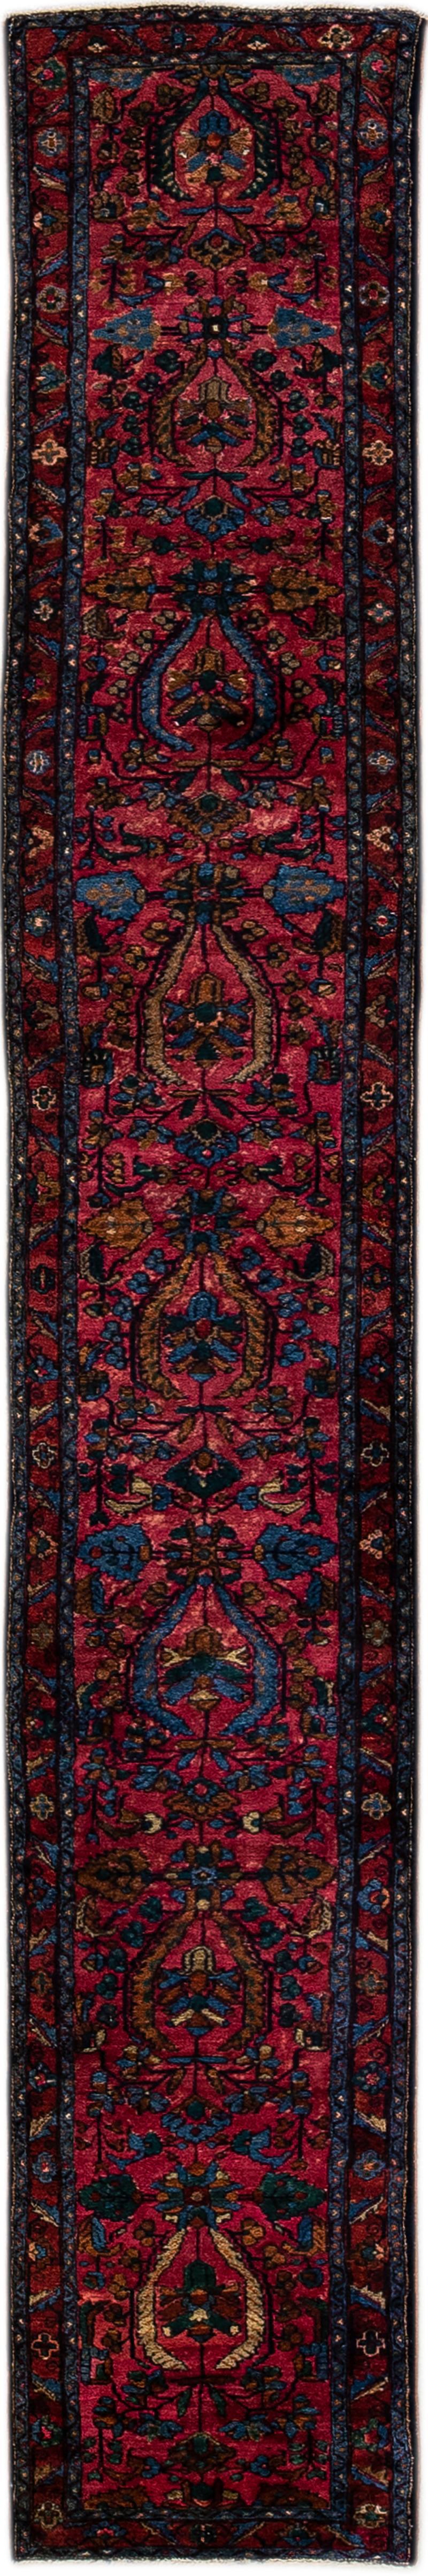 Antique Lilihan Handmade Allover Floral Motif Red Wool Runner